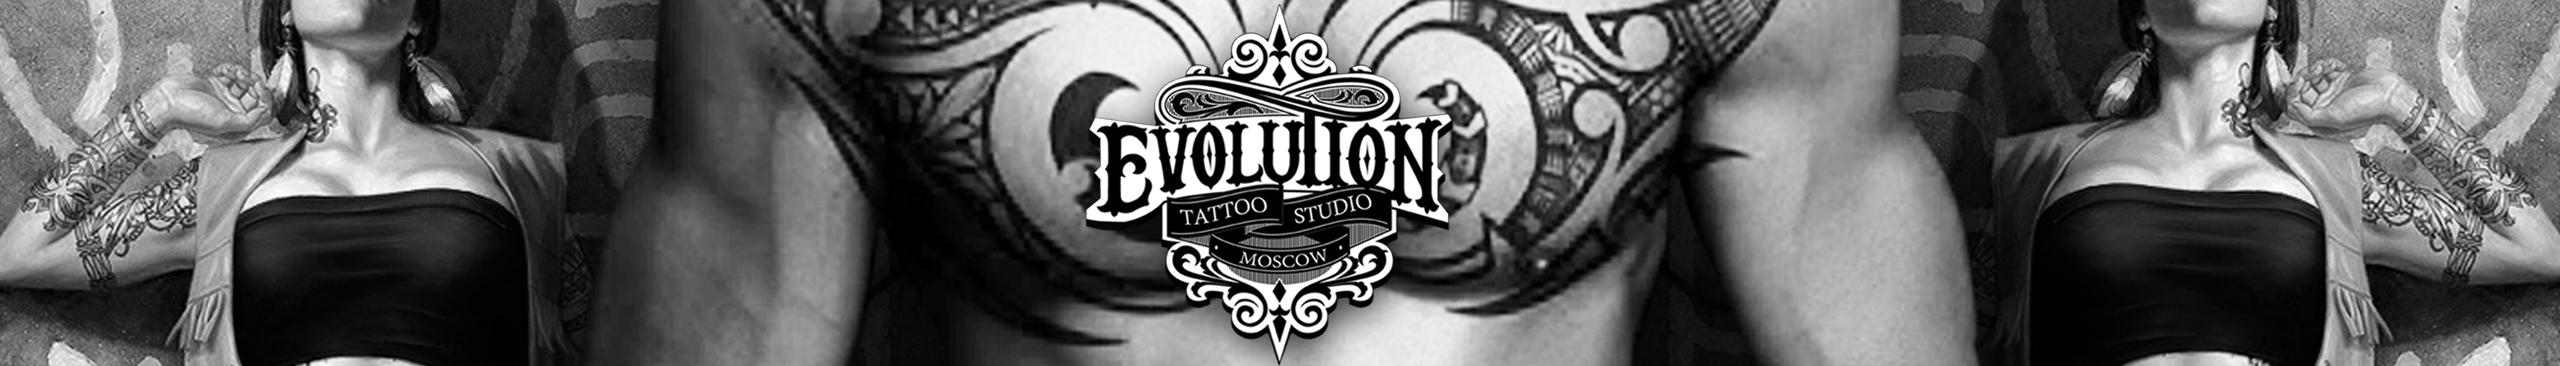 Студия тату и пирсинга Evo Logo